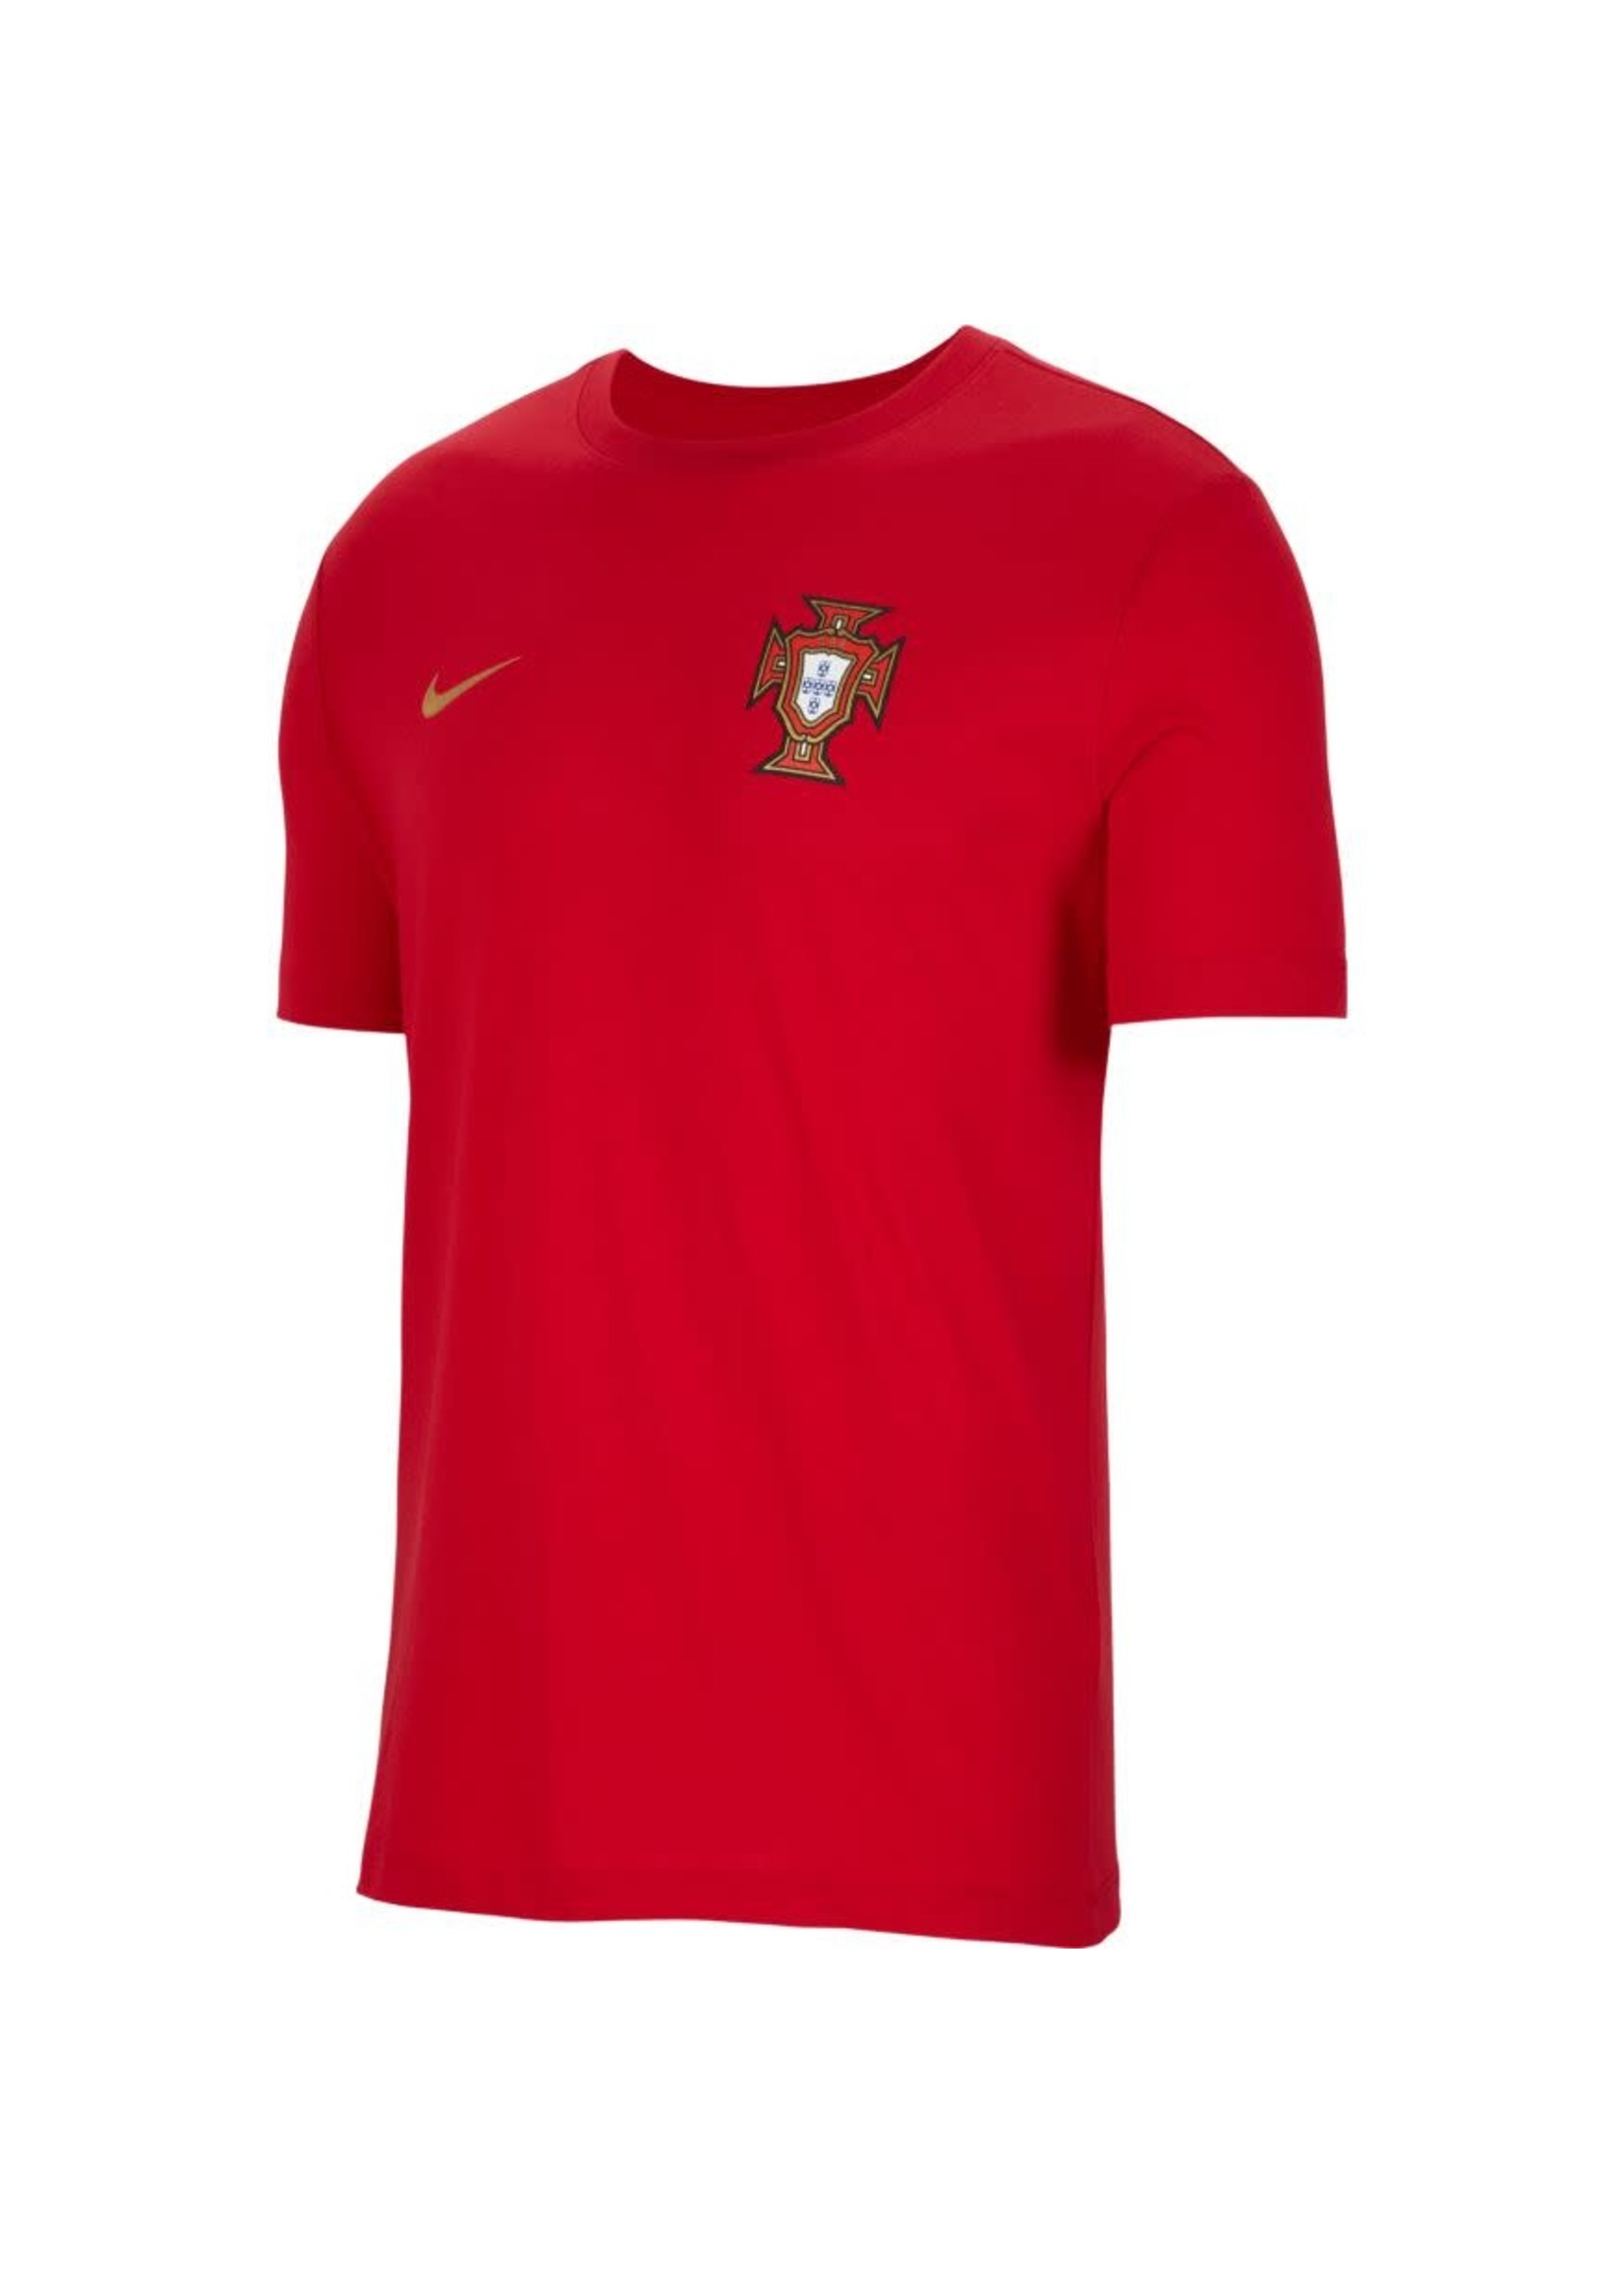 Nike Portugal T-Shirt - Ronaldo